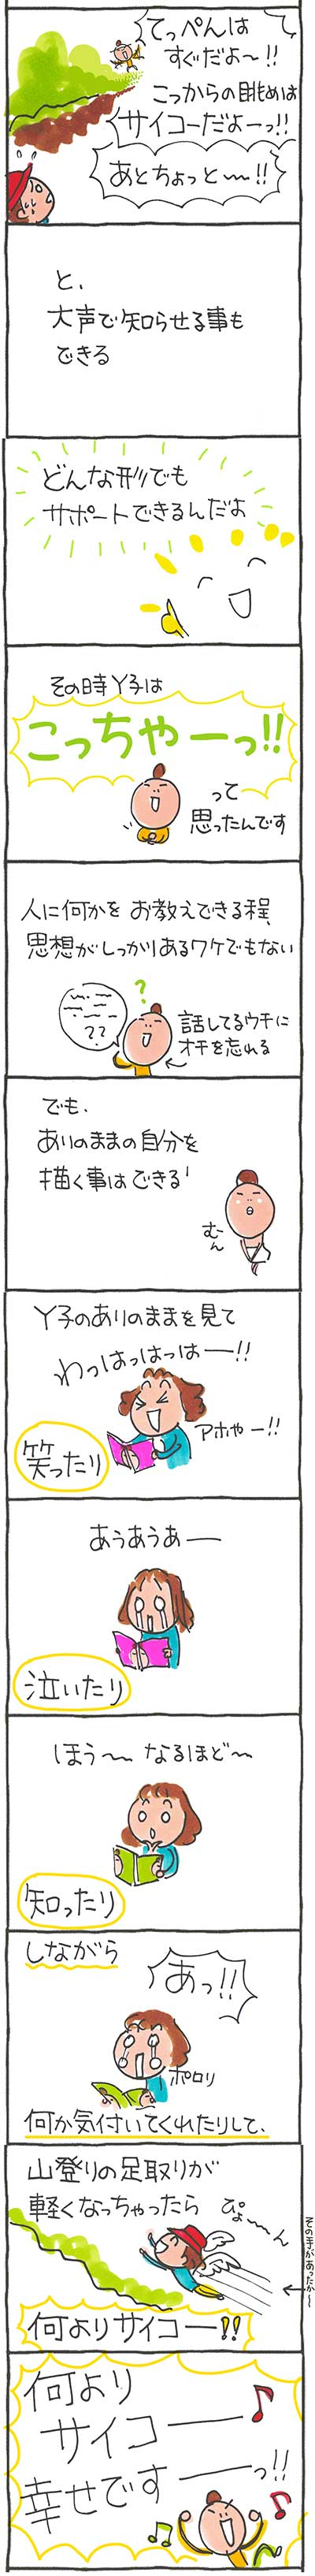 160421Y子元カウンセラーの卵